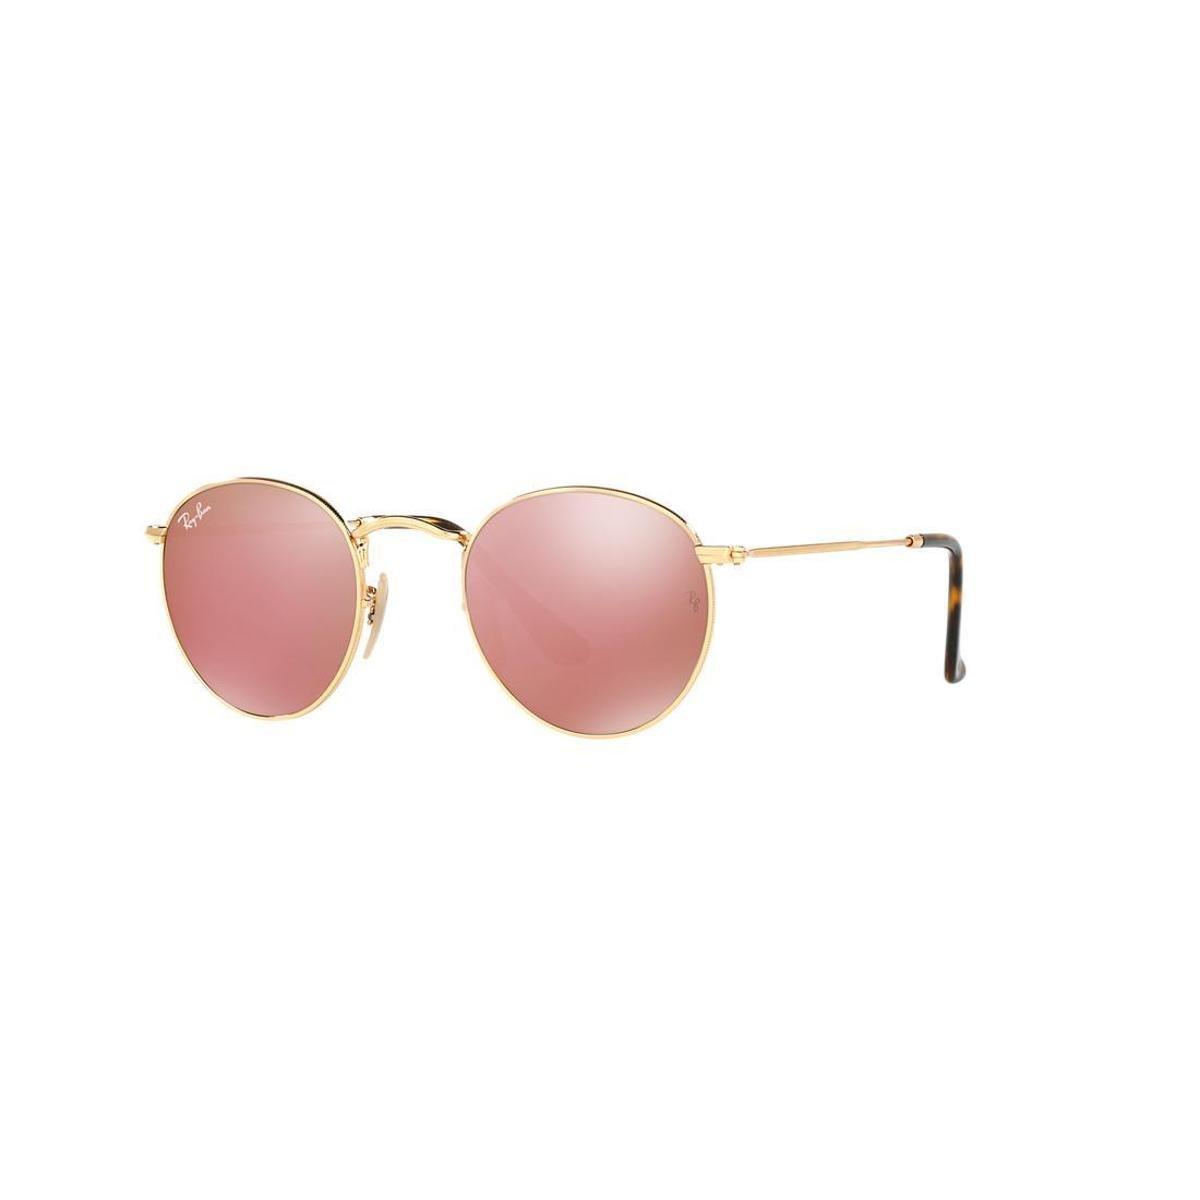 ed96646d31 Óculos de Sol Ray-Ban RB3447NL Round Metal - Compre Agora | Zattini